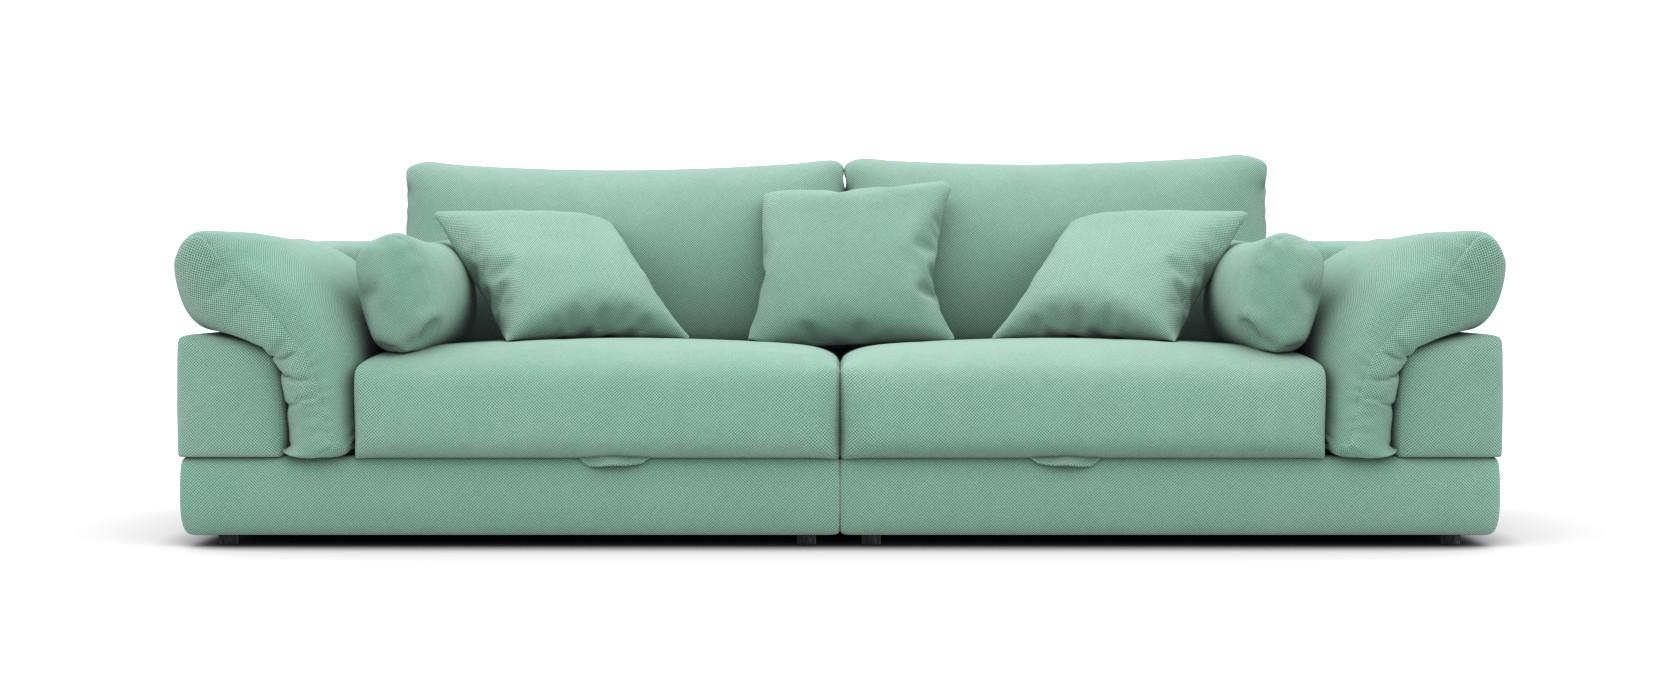 3-Sitzer Schlafsofa Nube